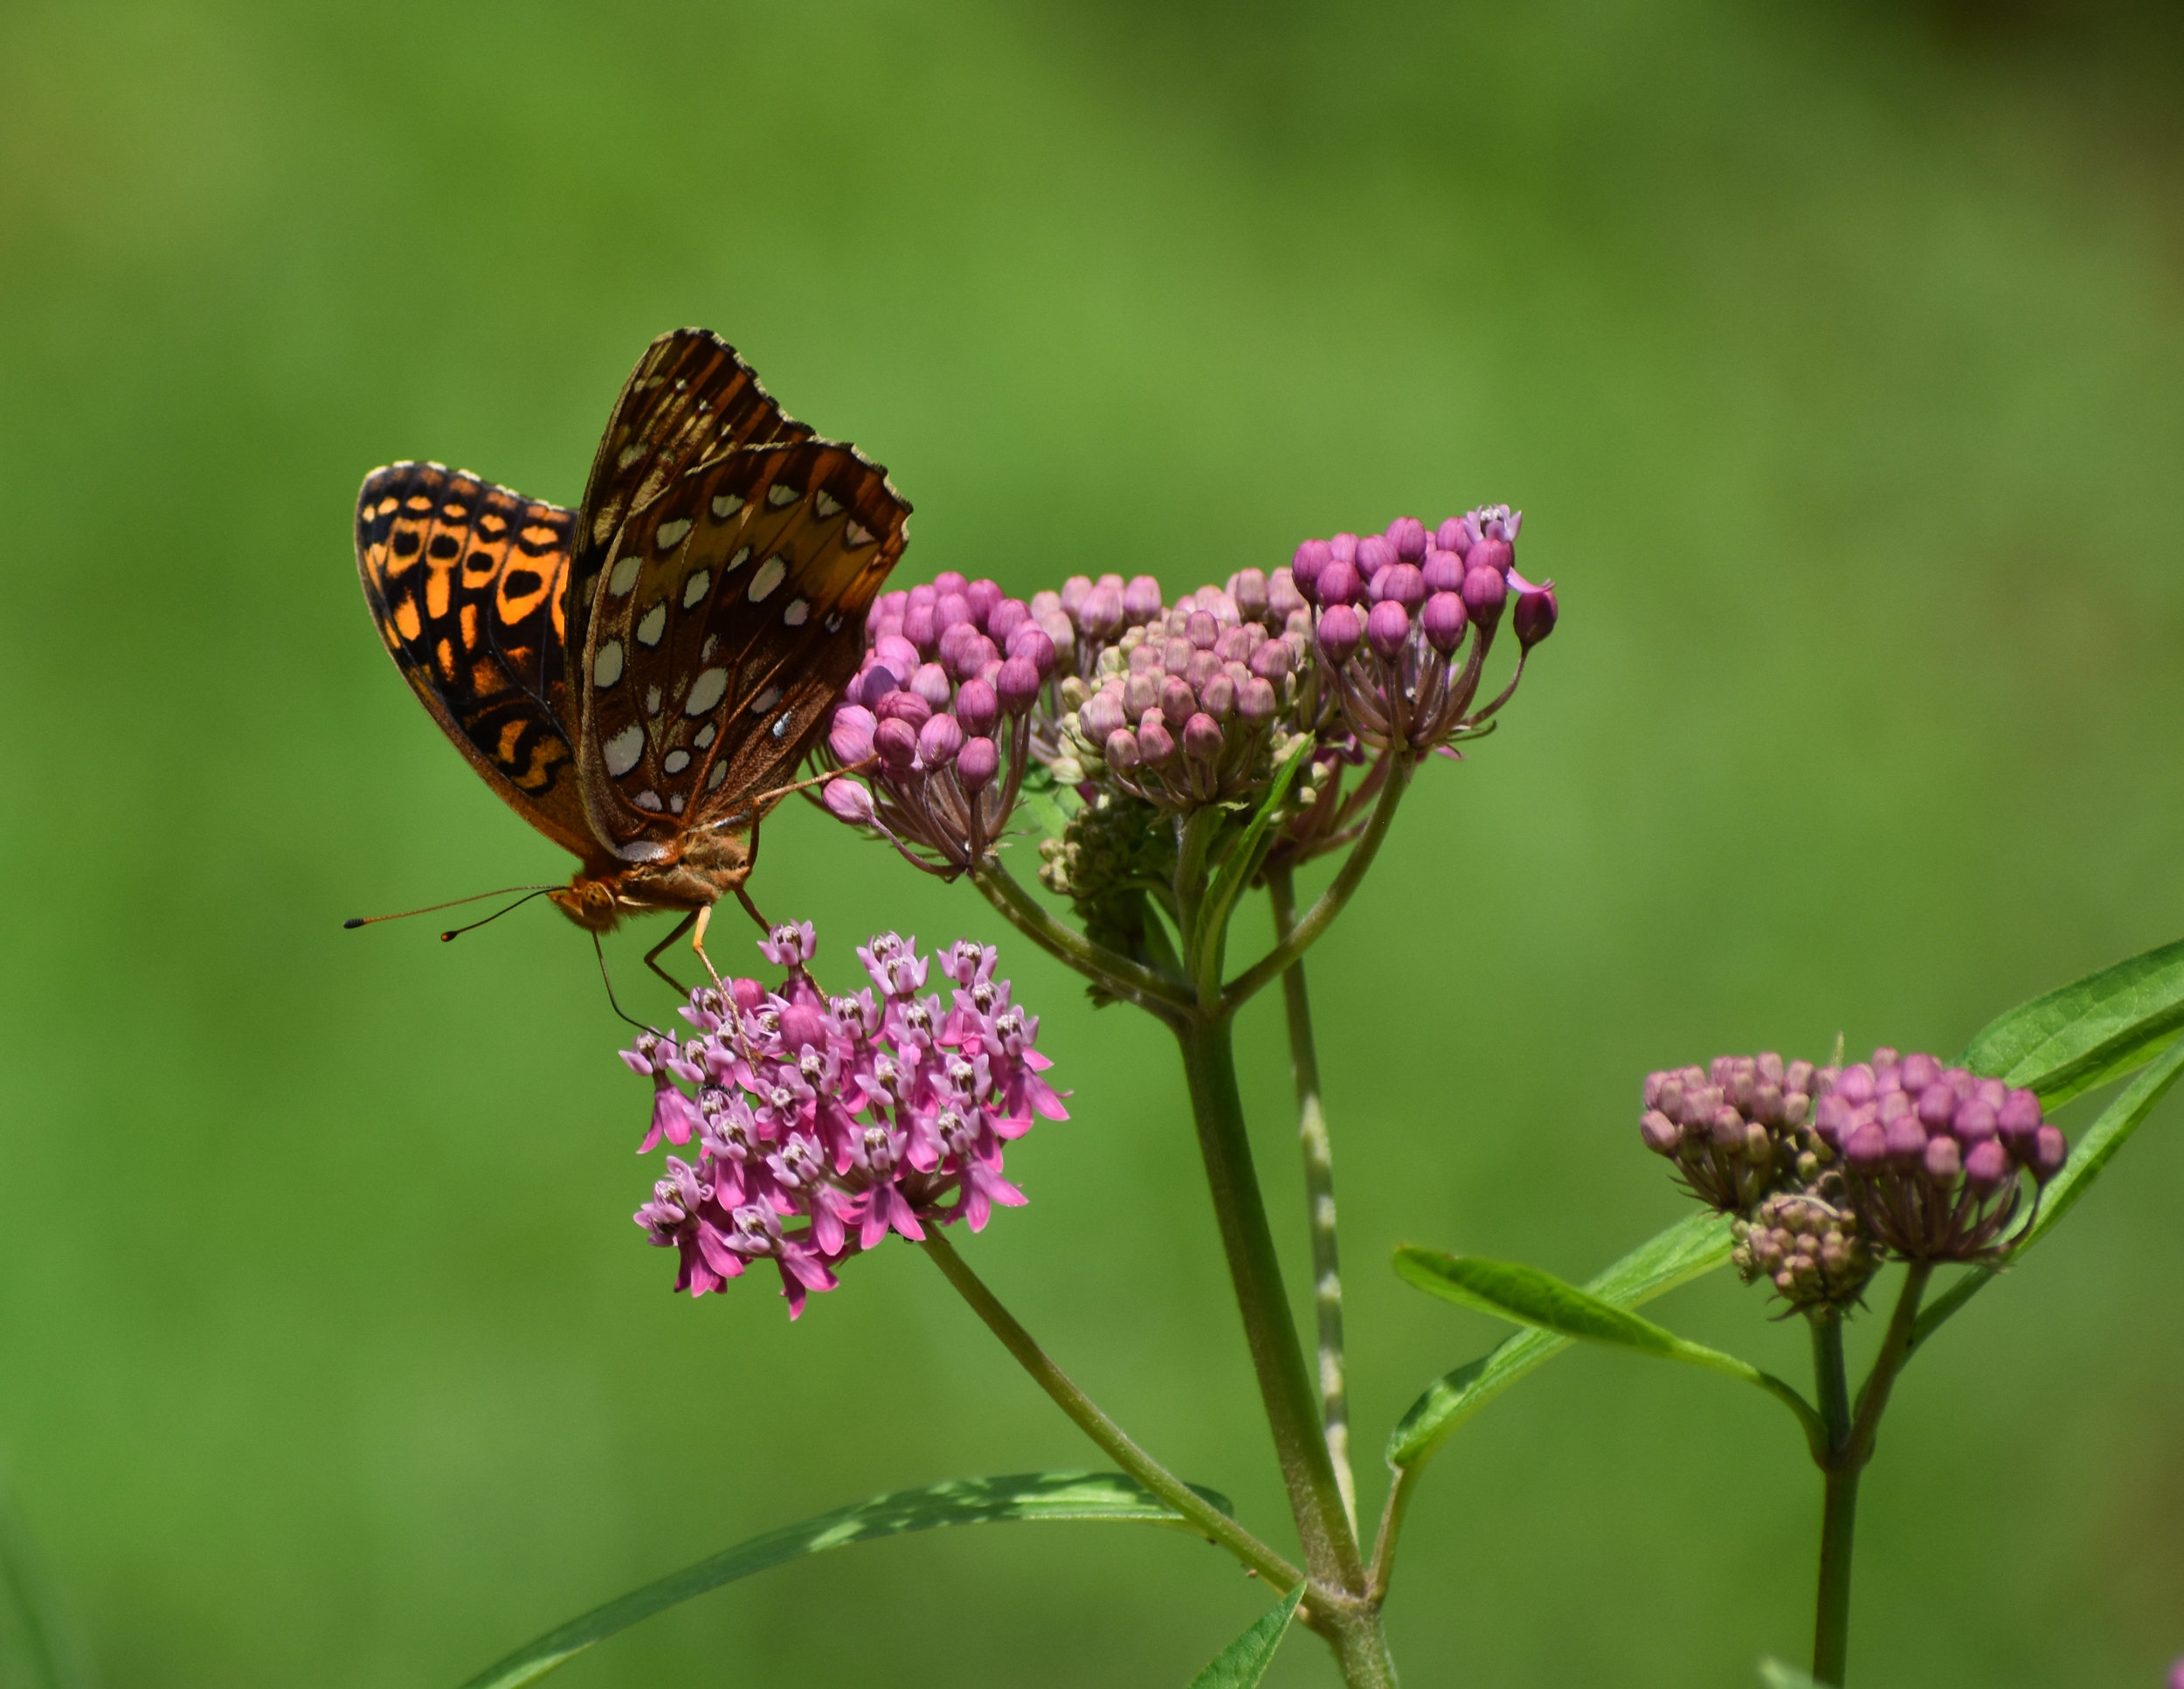 Butterfly on Swamp Milkweed Flower